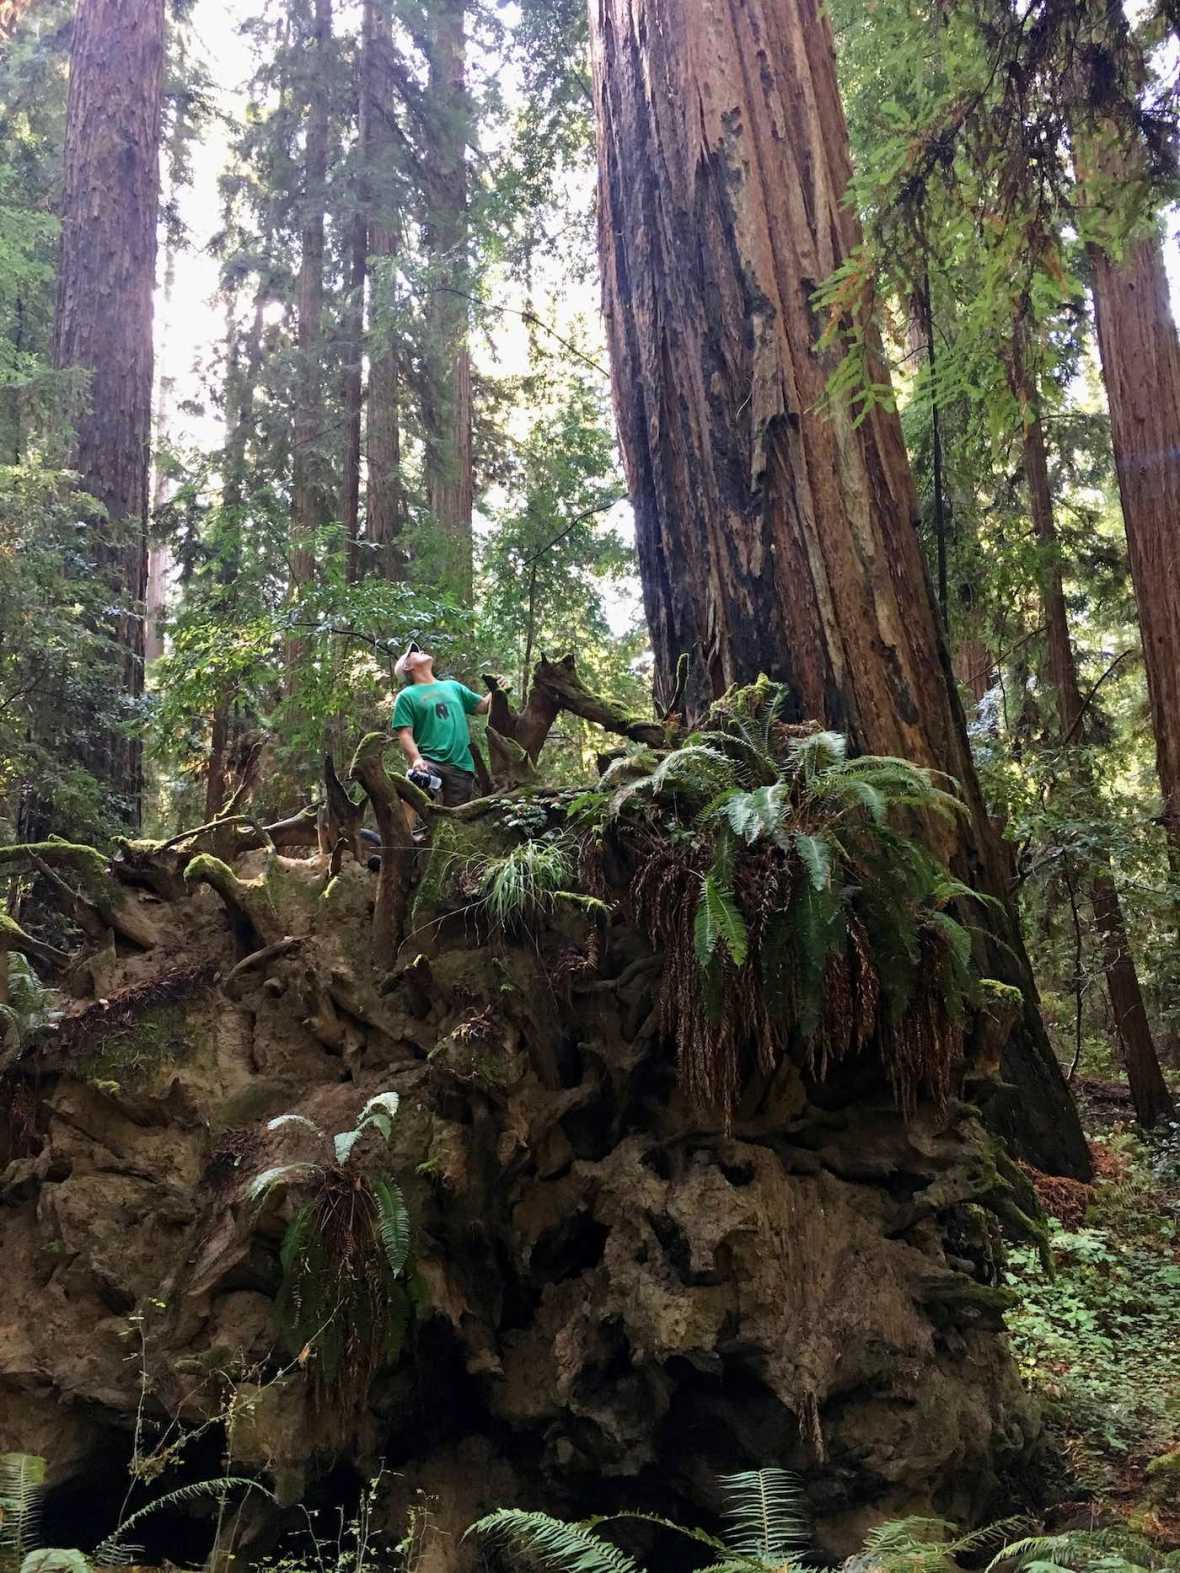 Fallen redwood tree in Big Hendy Grove at California's Hendy Woods State Park